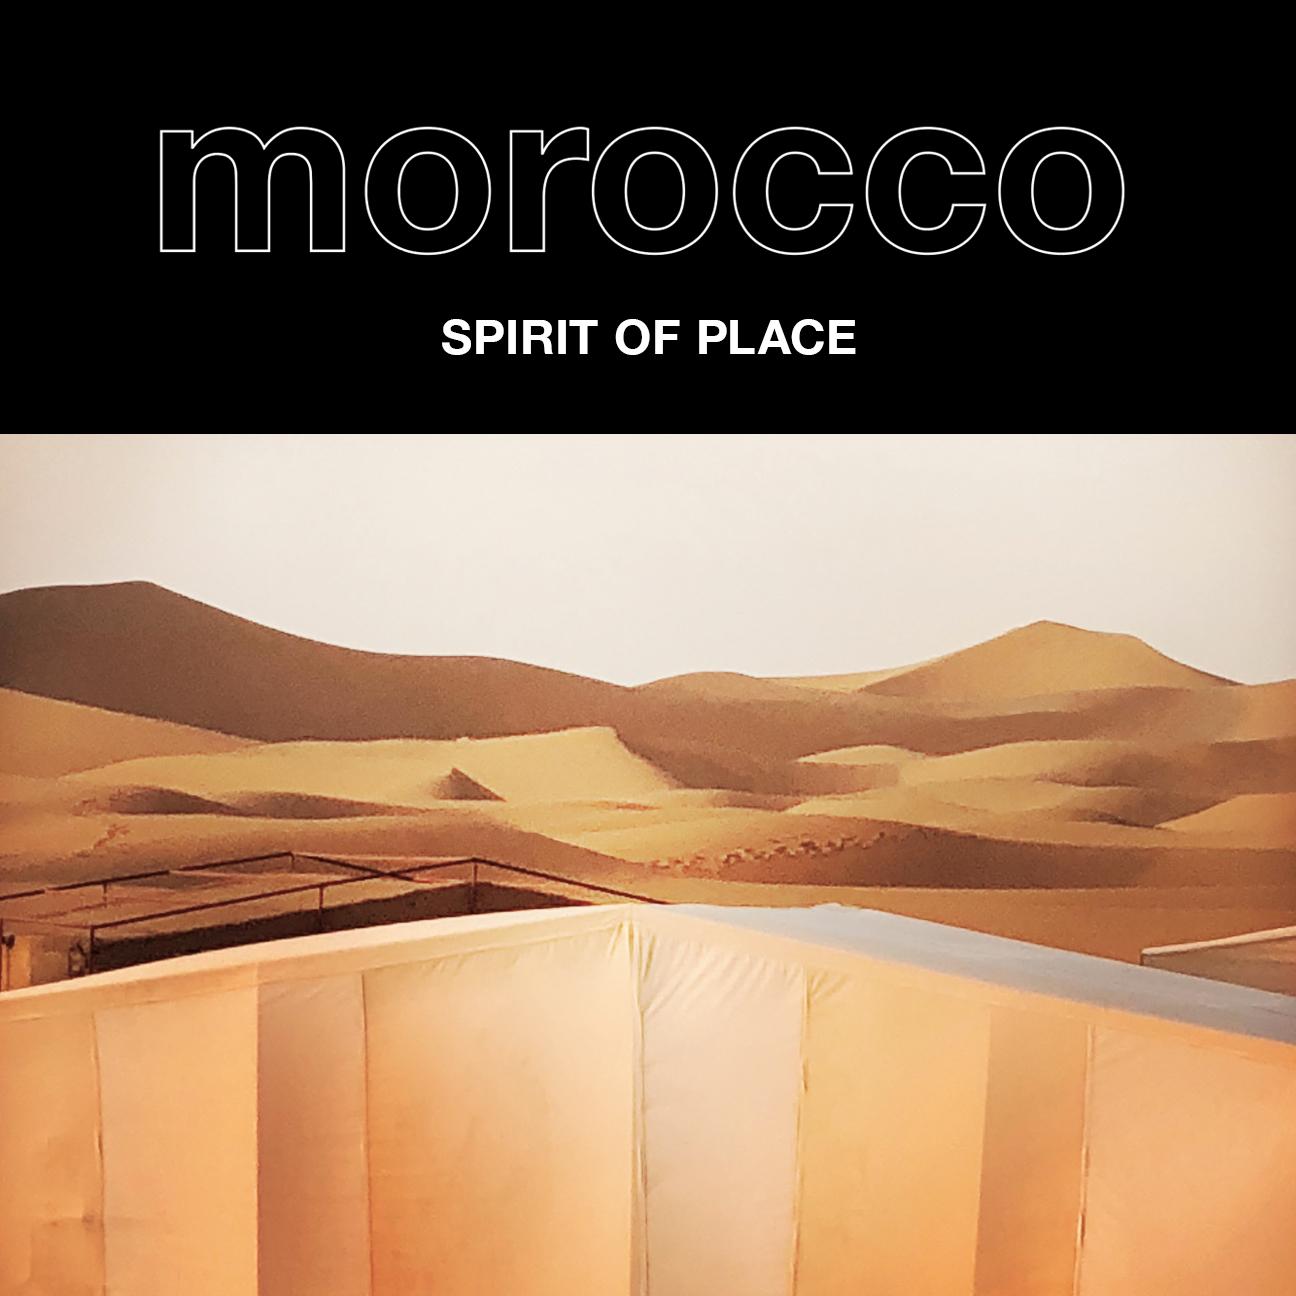 Morocco promo image_face.jpg